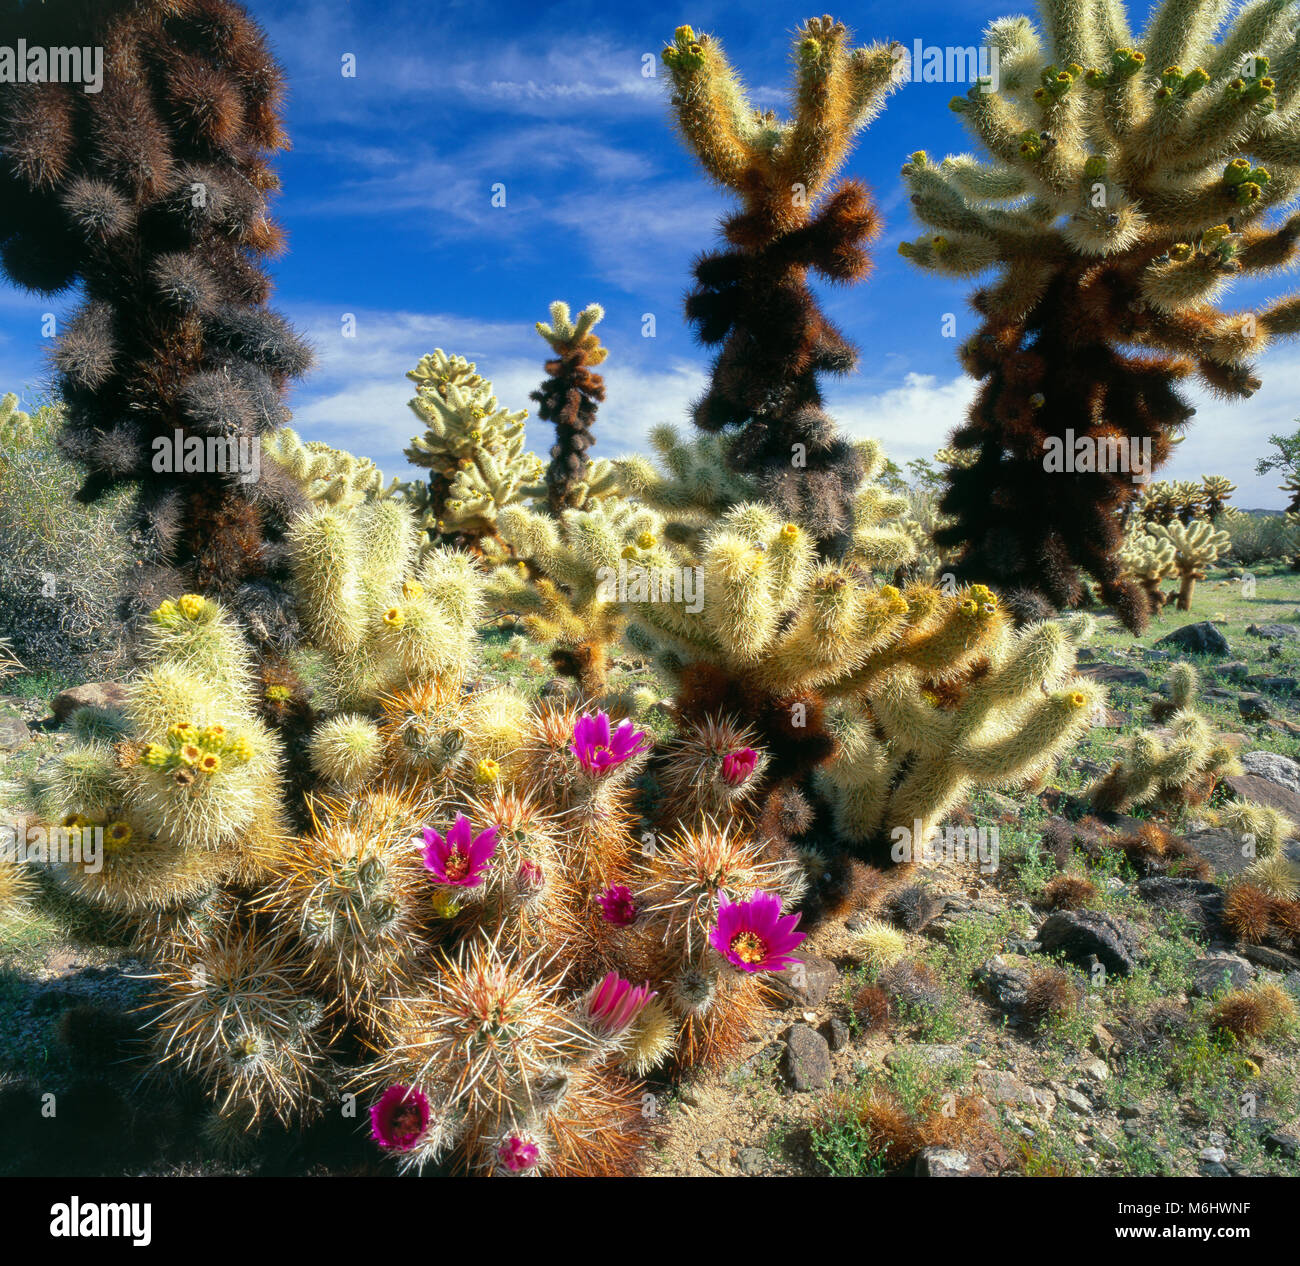 Hedgehogs, Cholla, Cholla Garden, Joshua Tree National Park, California - Stock Image